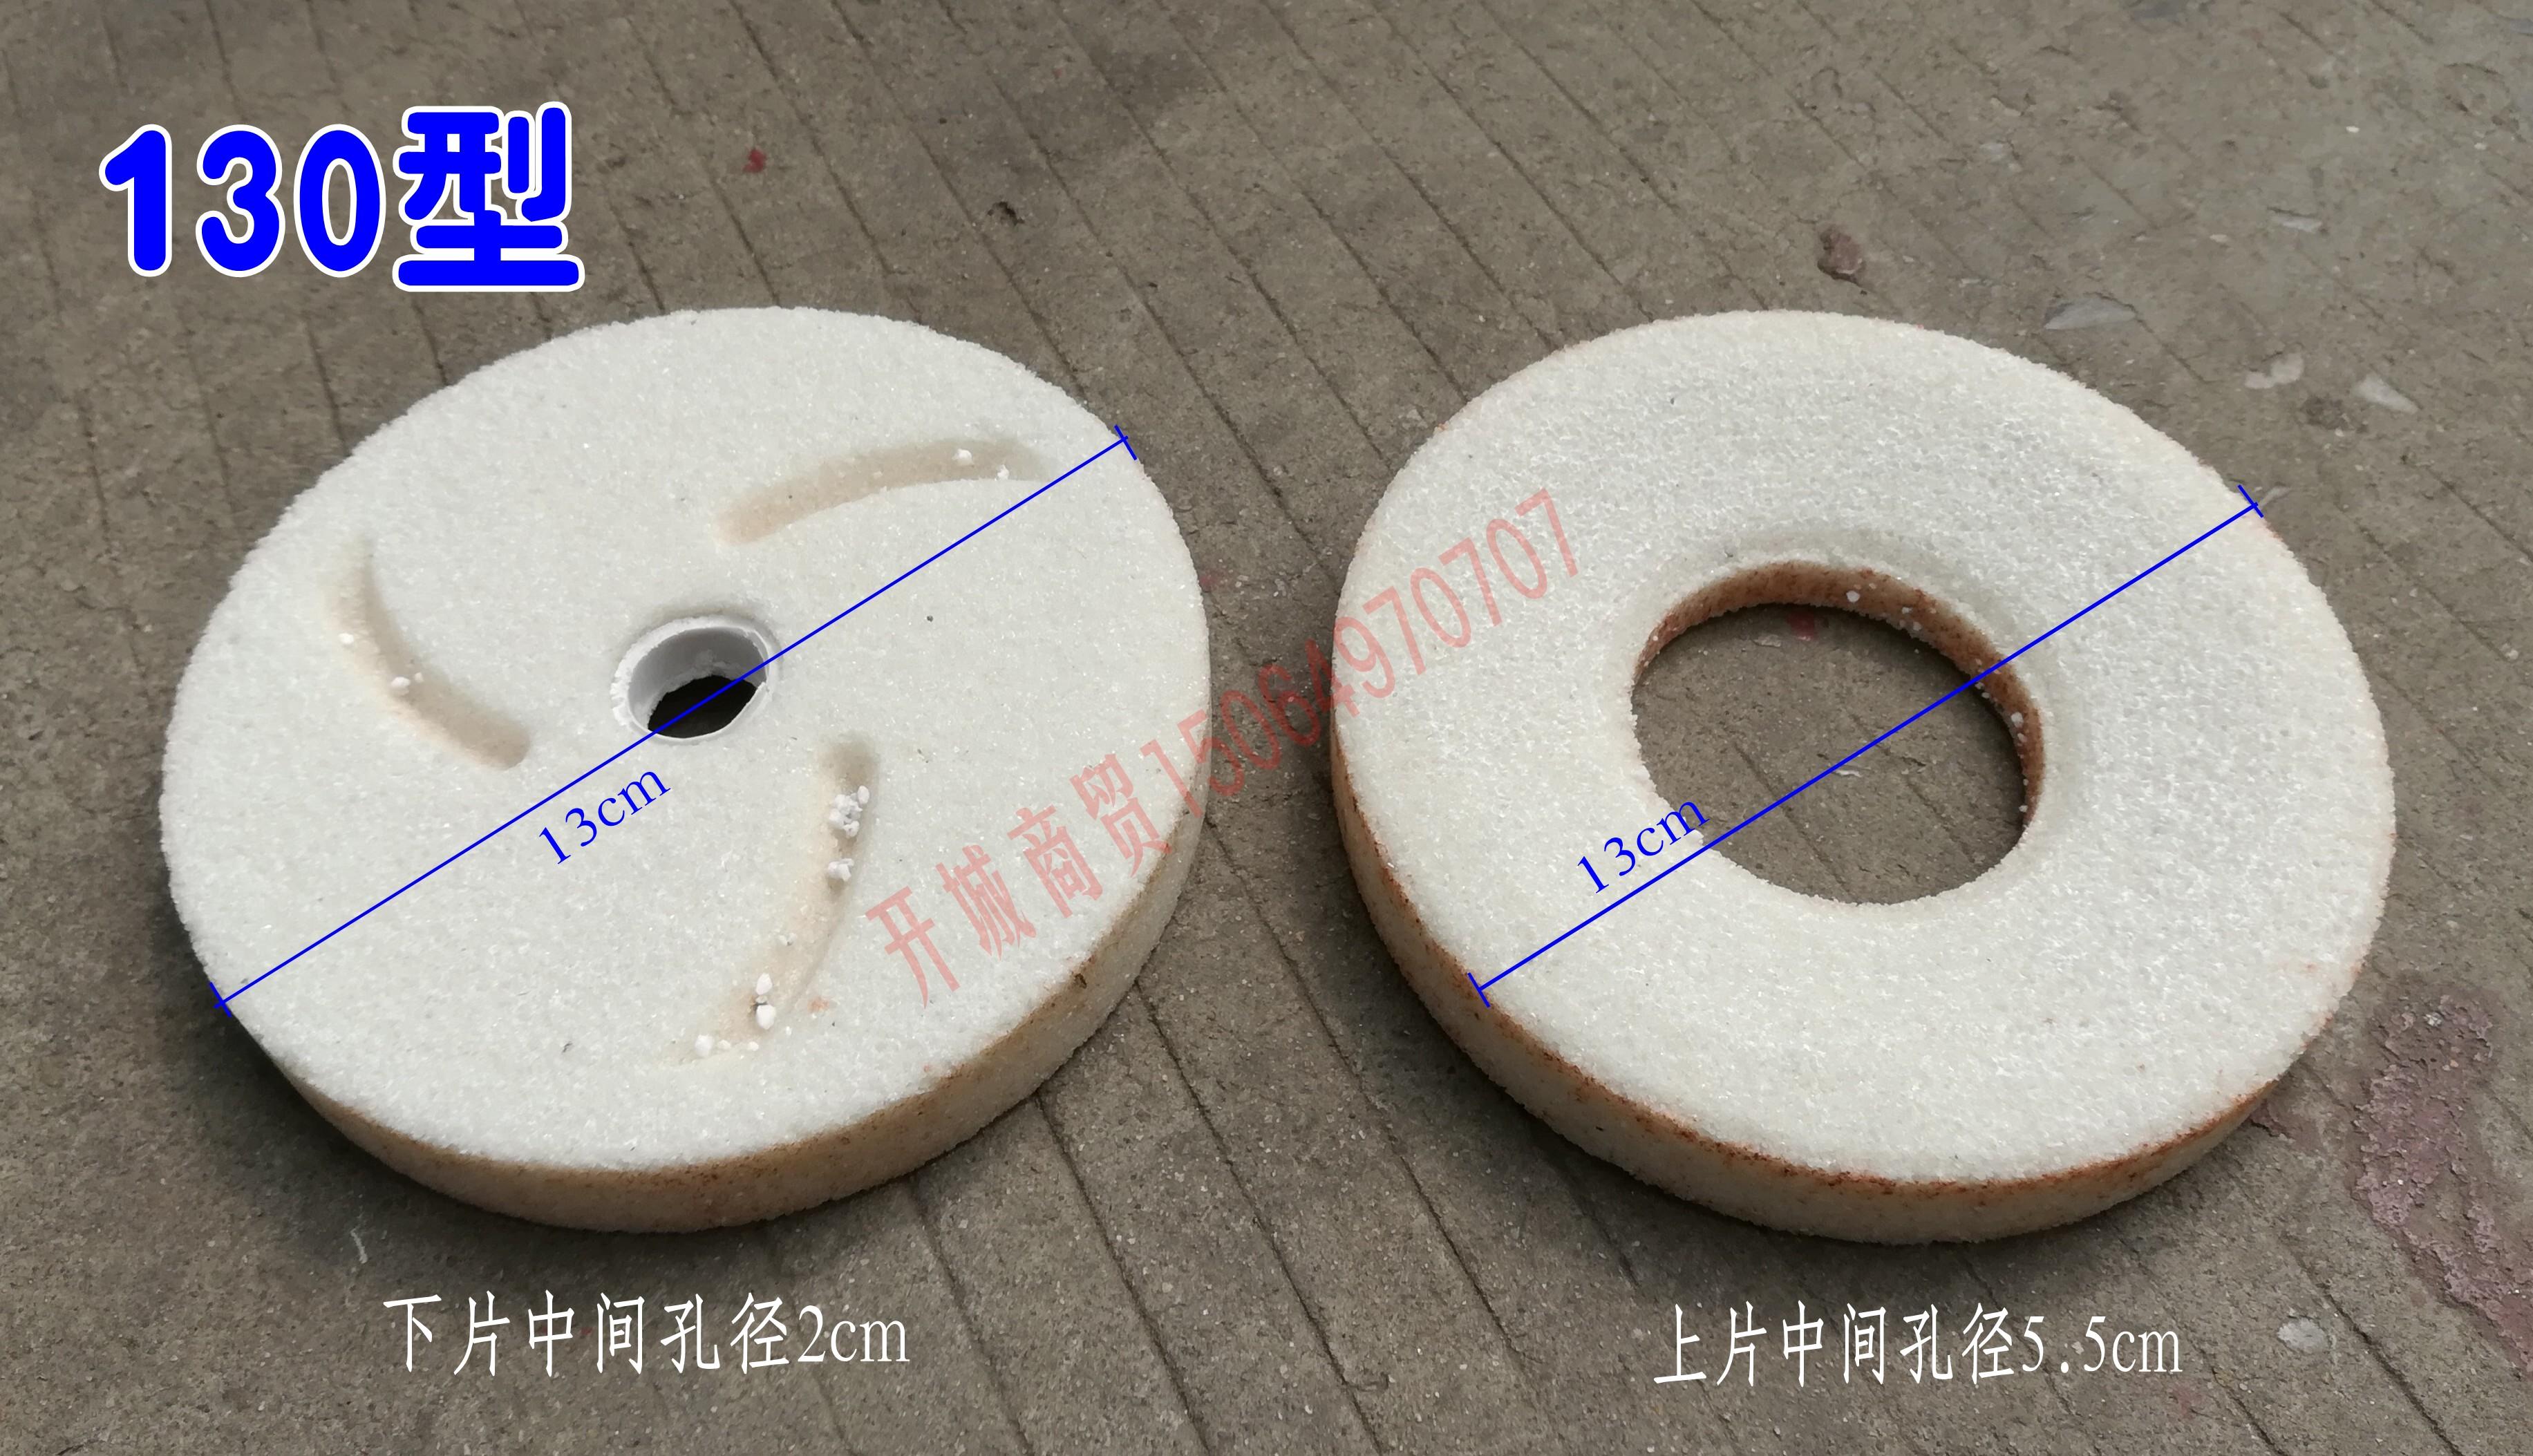 Liaoning Linghai grinding machine grinding wheel grinding machine accessories Soybean Milk white corundum grinding wheel type 130 type 150 type 180